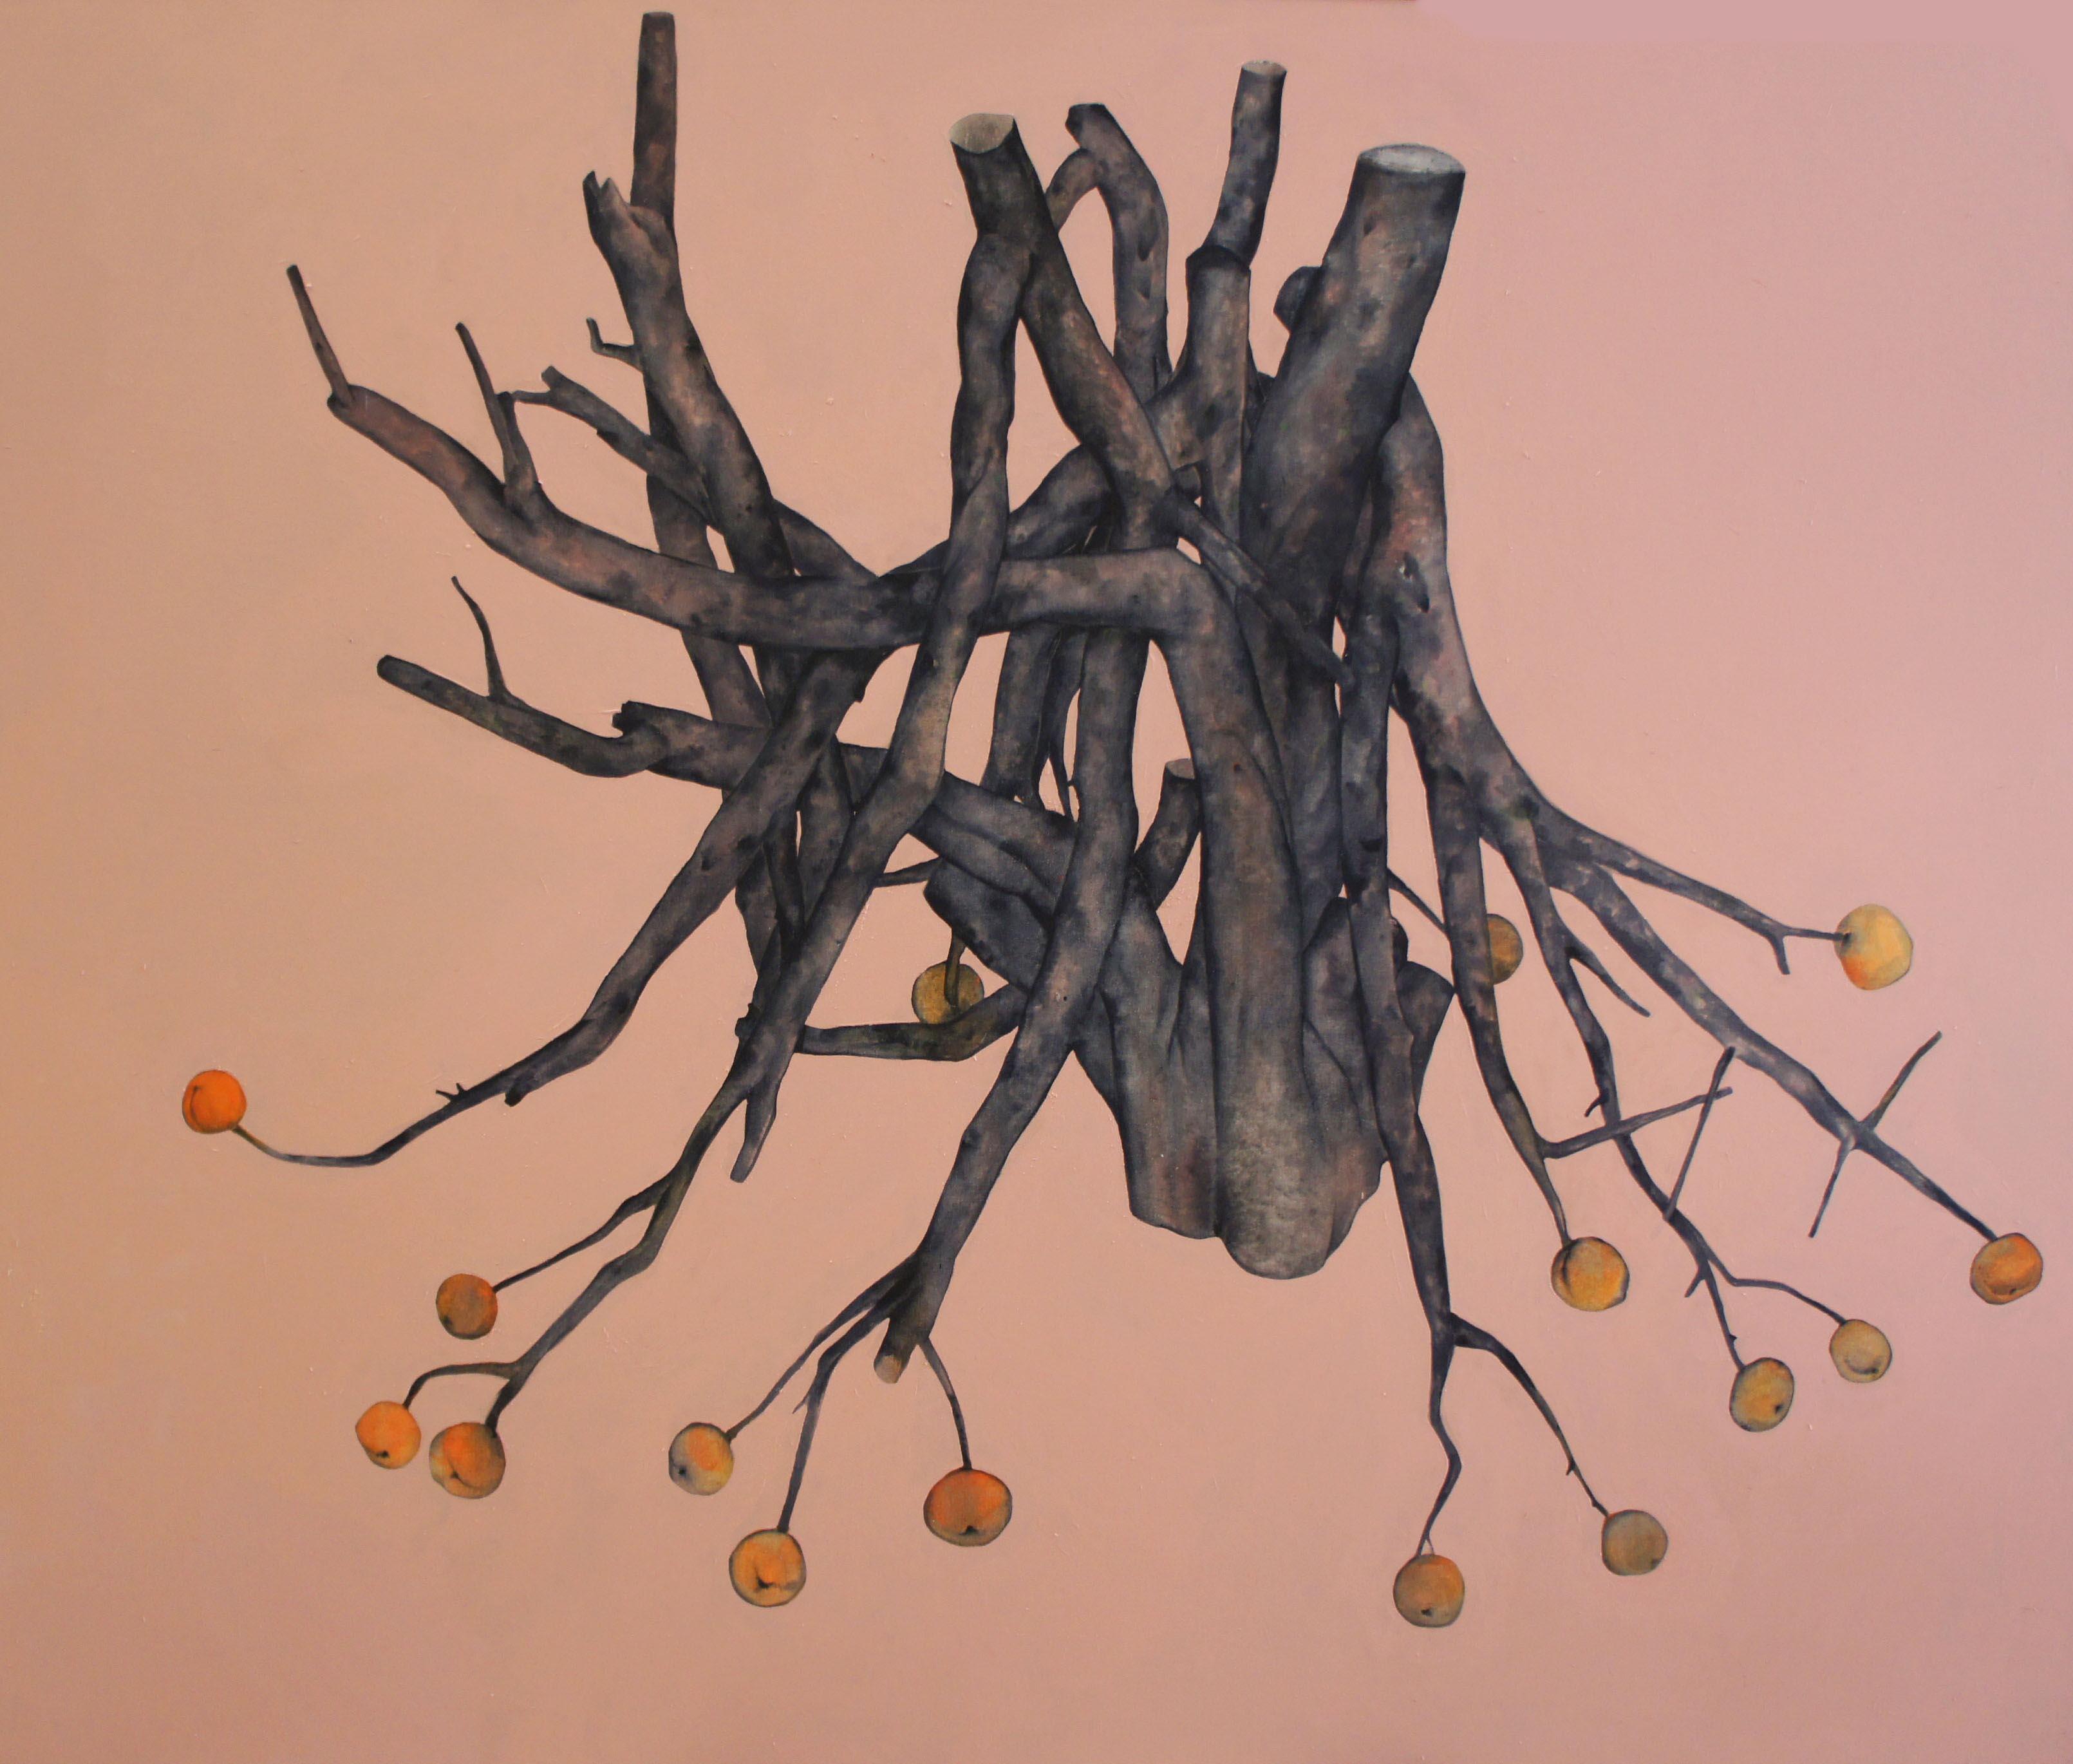 árbol con duraznos